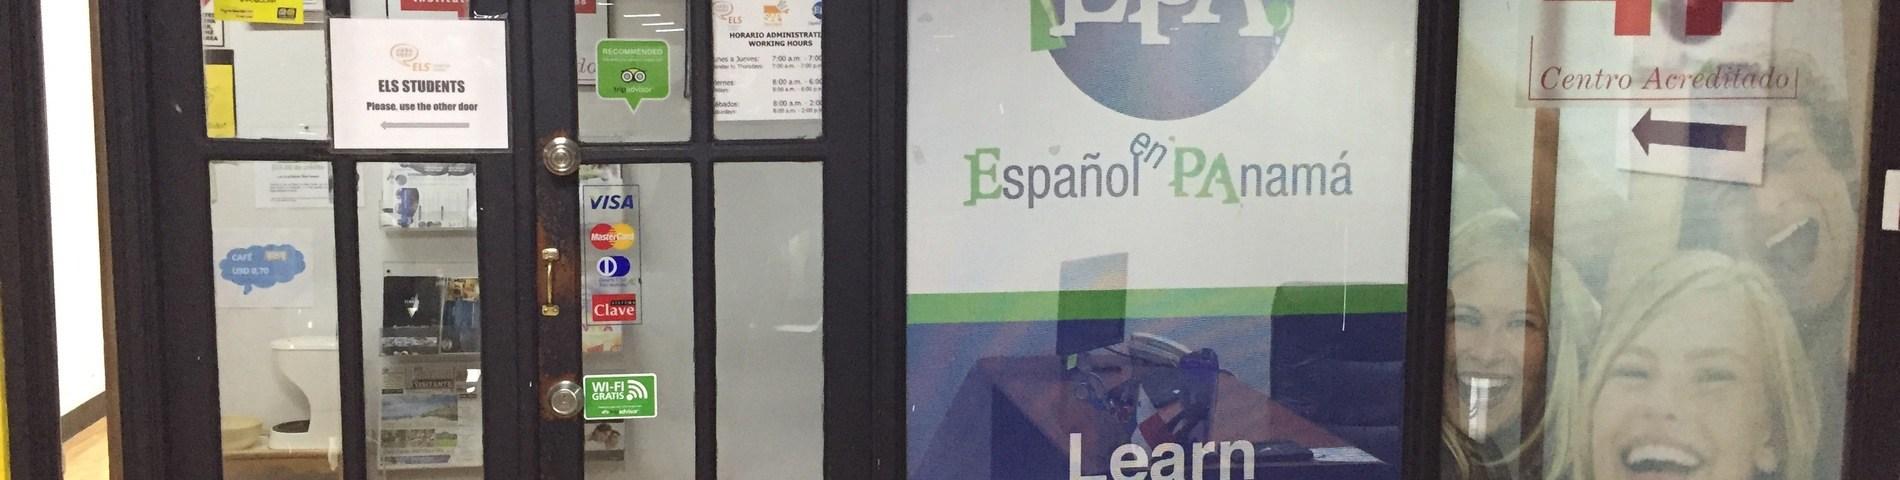 EPA! Español en Panamá Bild 1